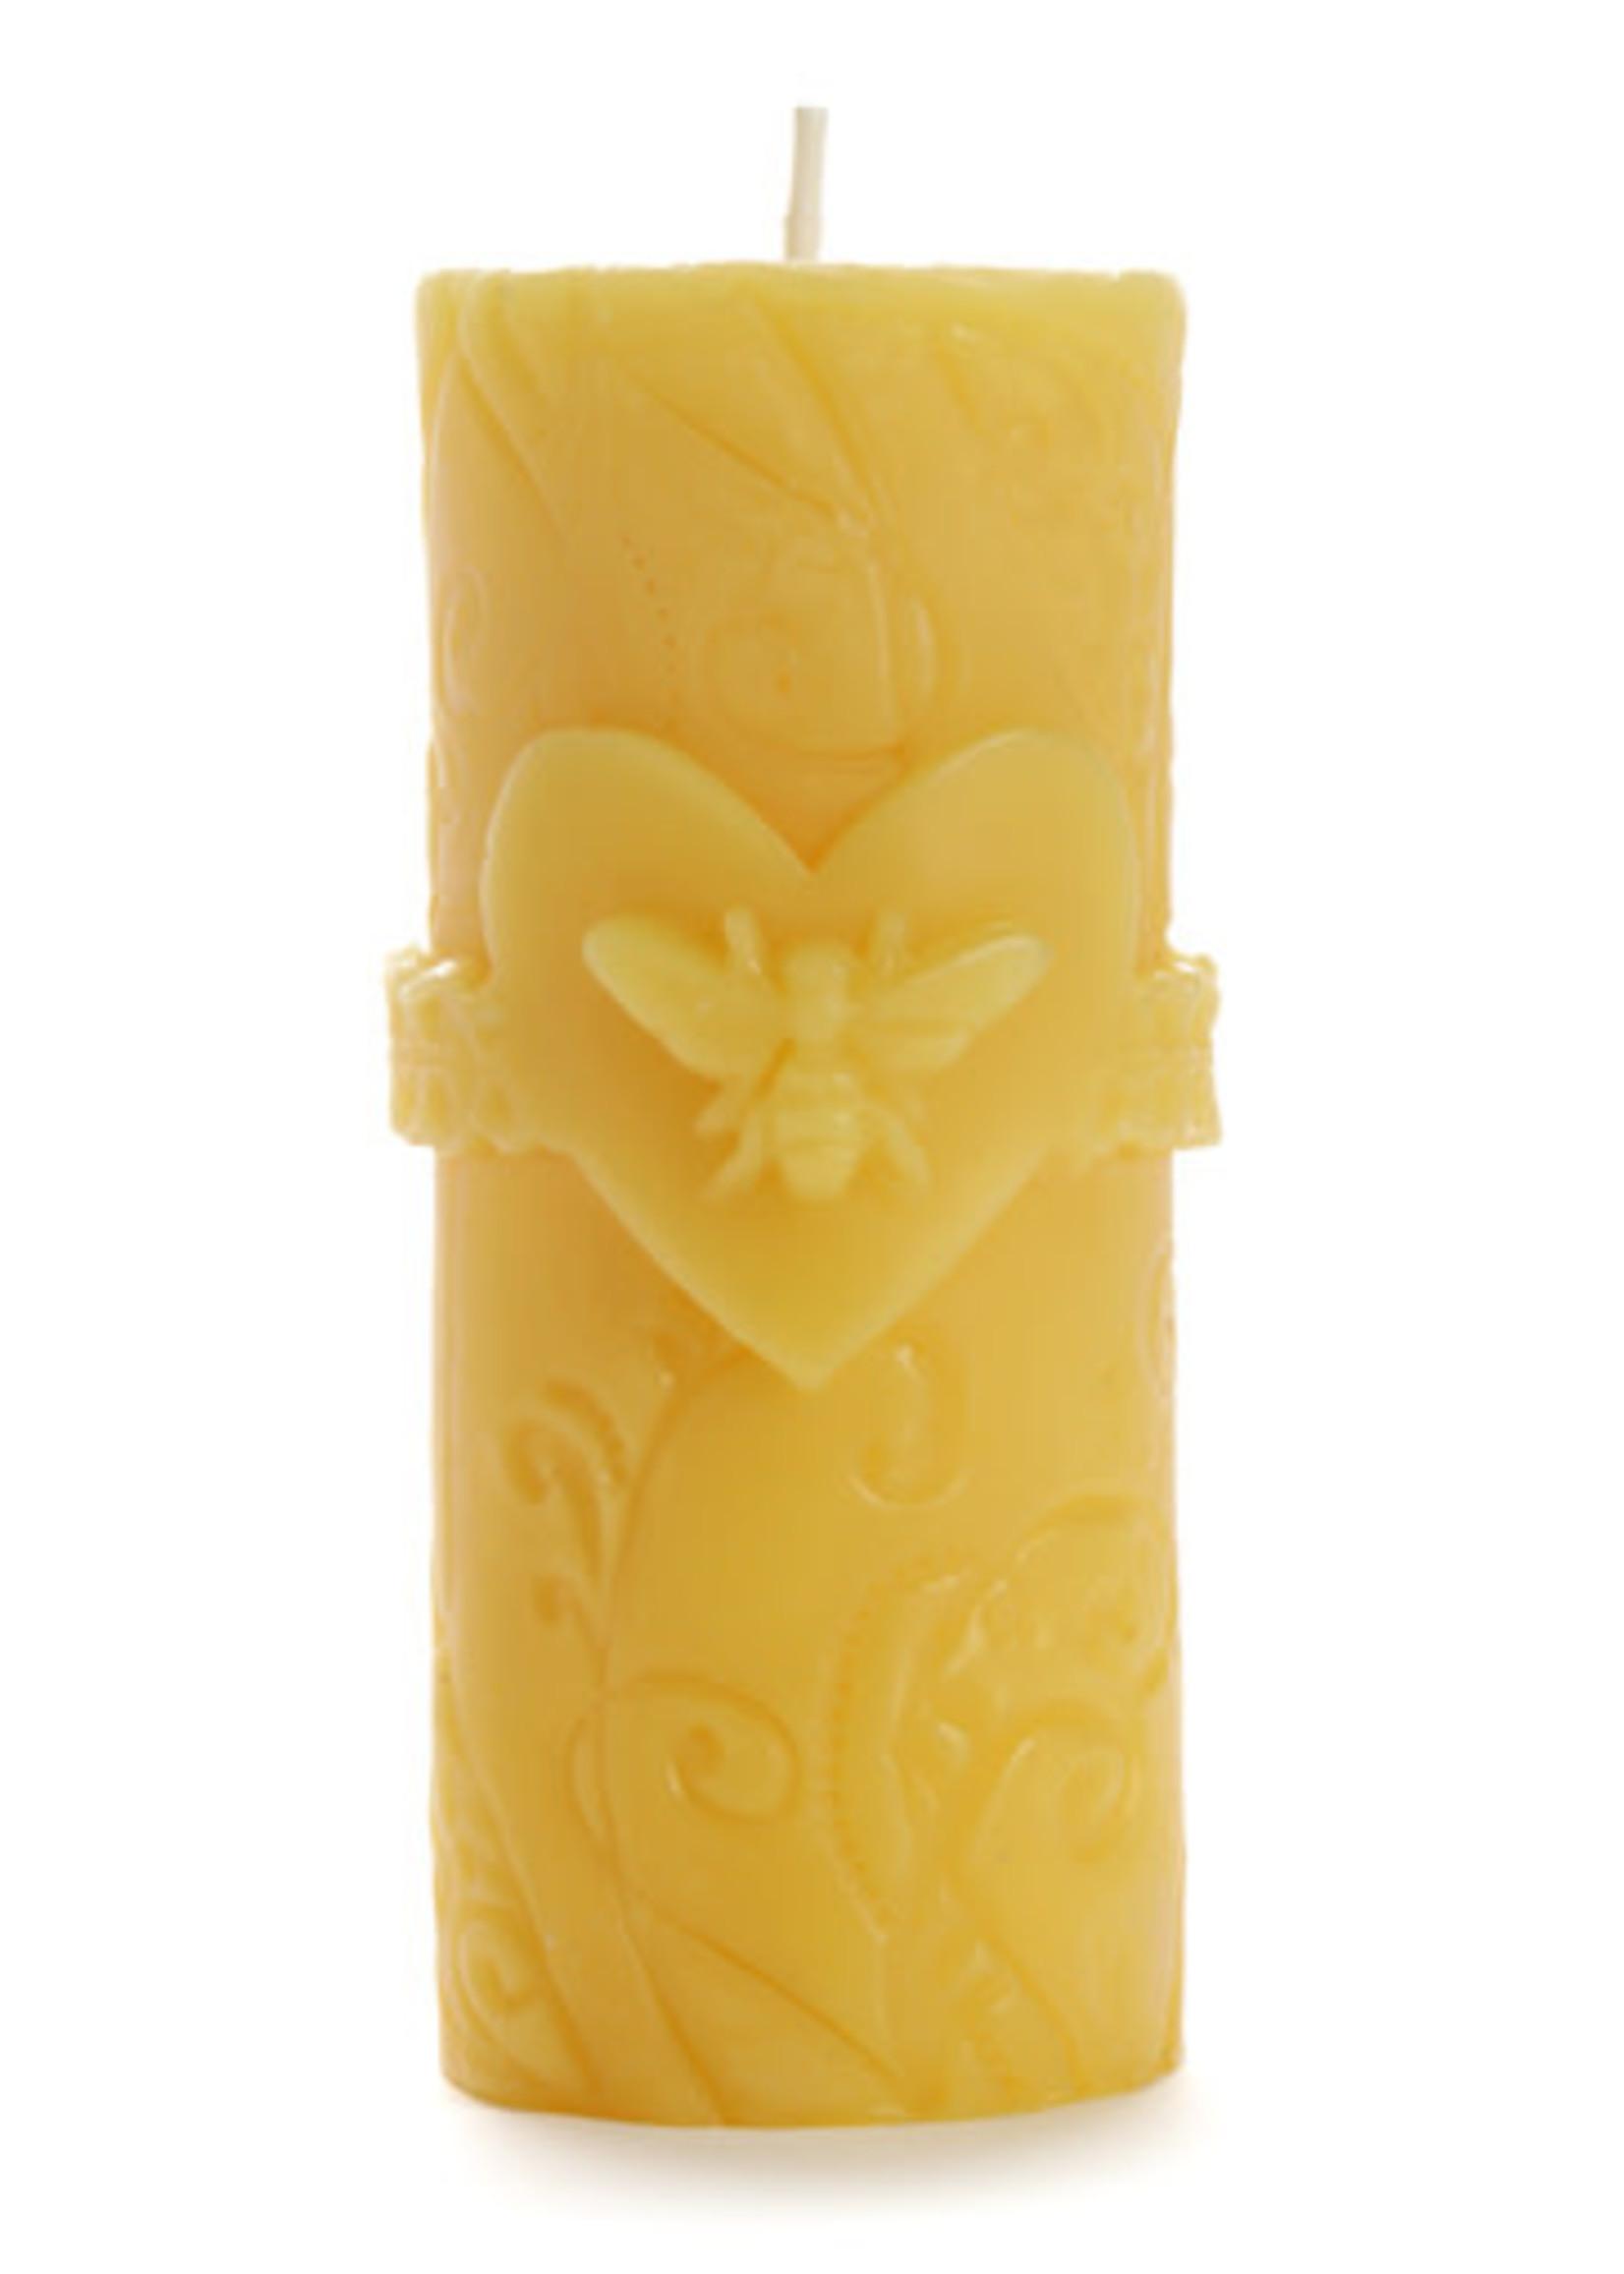 Beeswax Bee Love Pillar